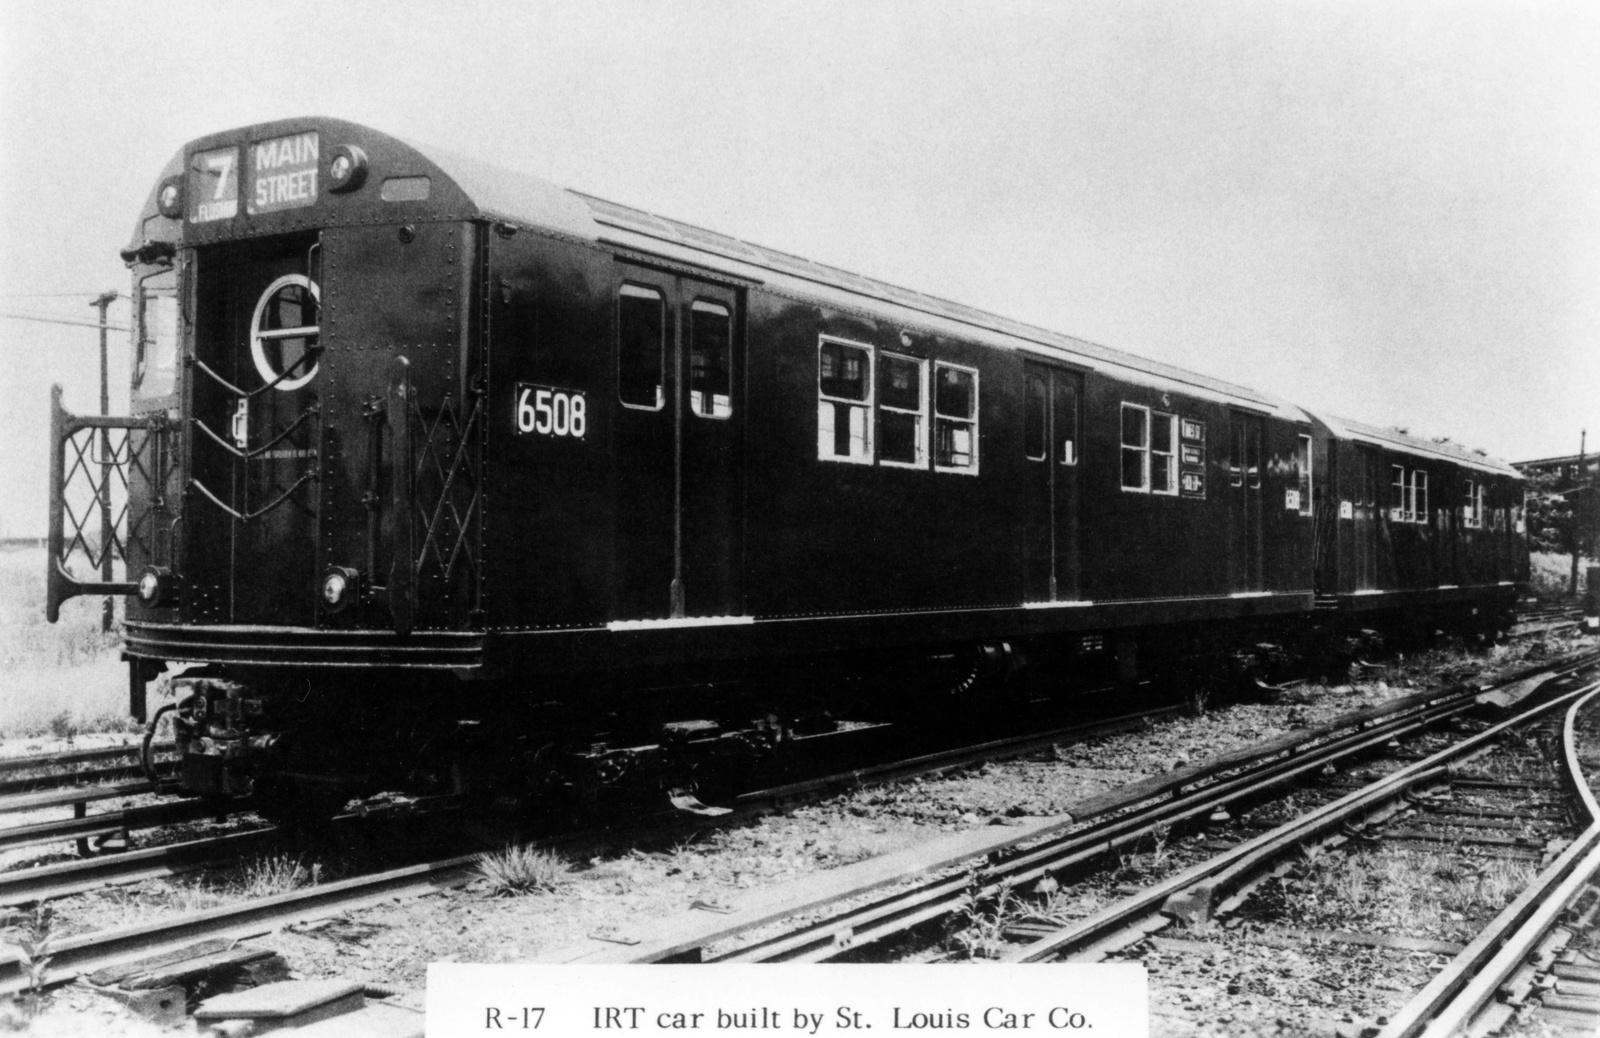 (188k, 1024x692)<br><b>Country:</b> United States<br><b>City:</b> New York<br><b>System:</b> New York City Transit<br><b>Location:</b> Westchester Yard<br><b>Car:</b> R-17 (St. Louis, 1955-56) 6508 <br><b>Collection of:</b> George Conrad Collection<br><b>Viewed (this week/total):</b> 4 / 887